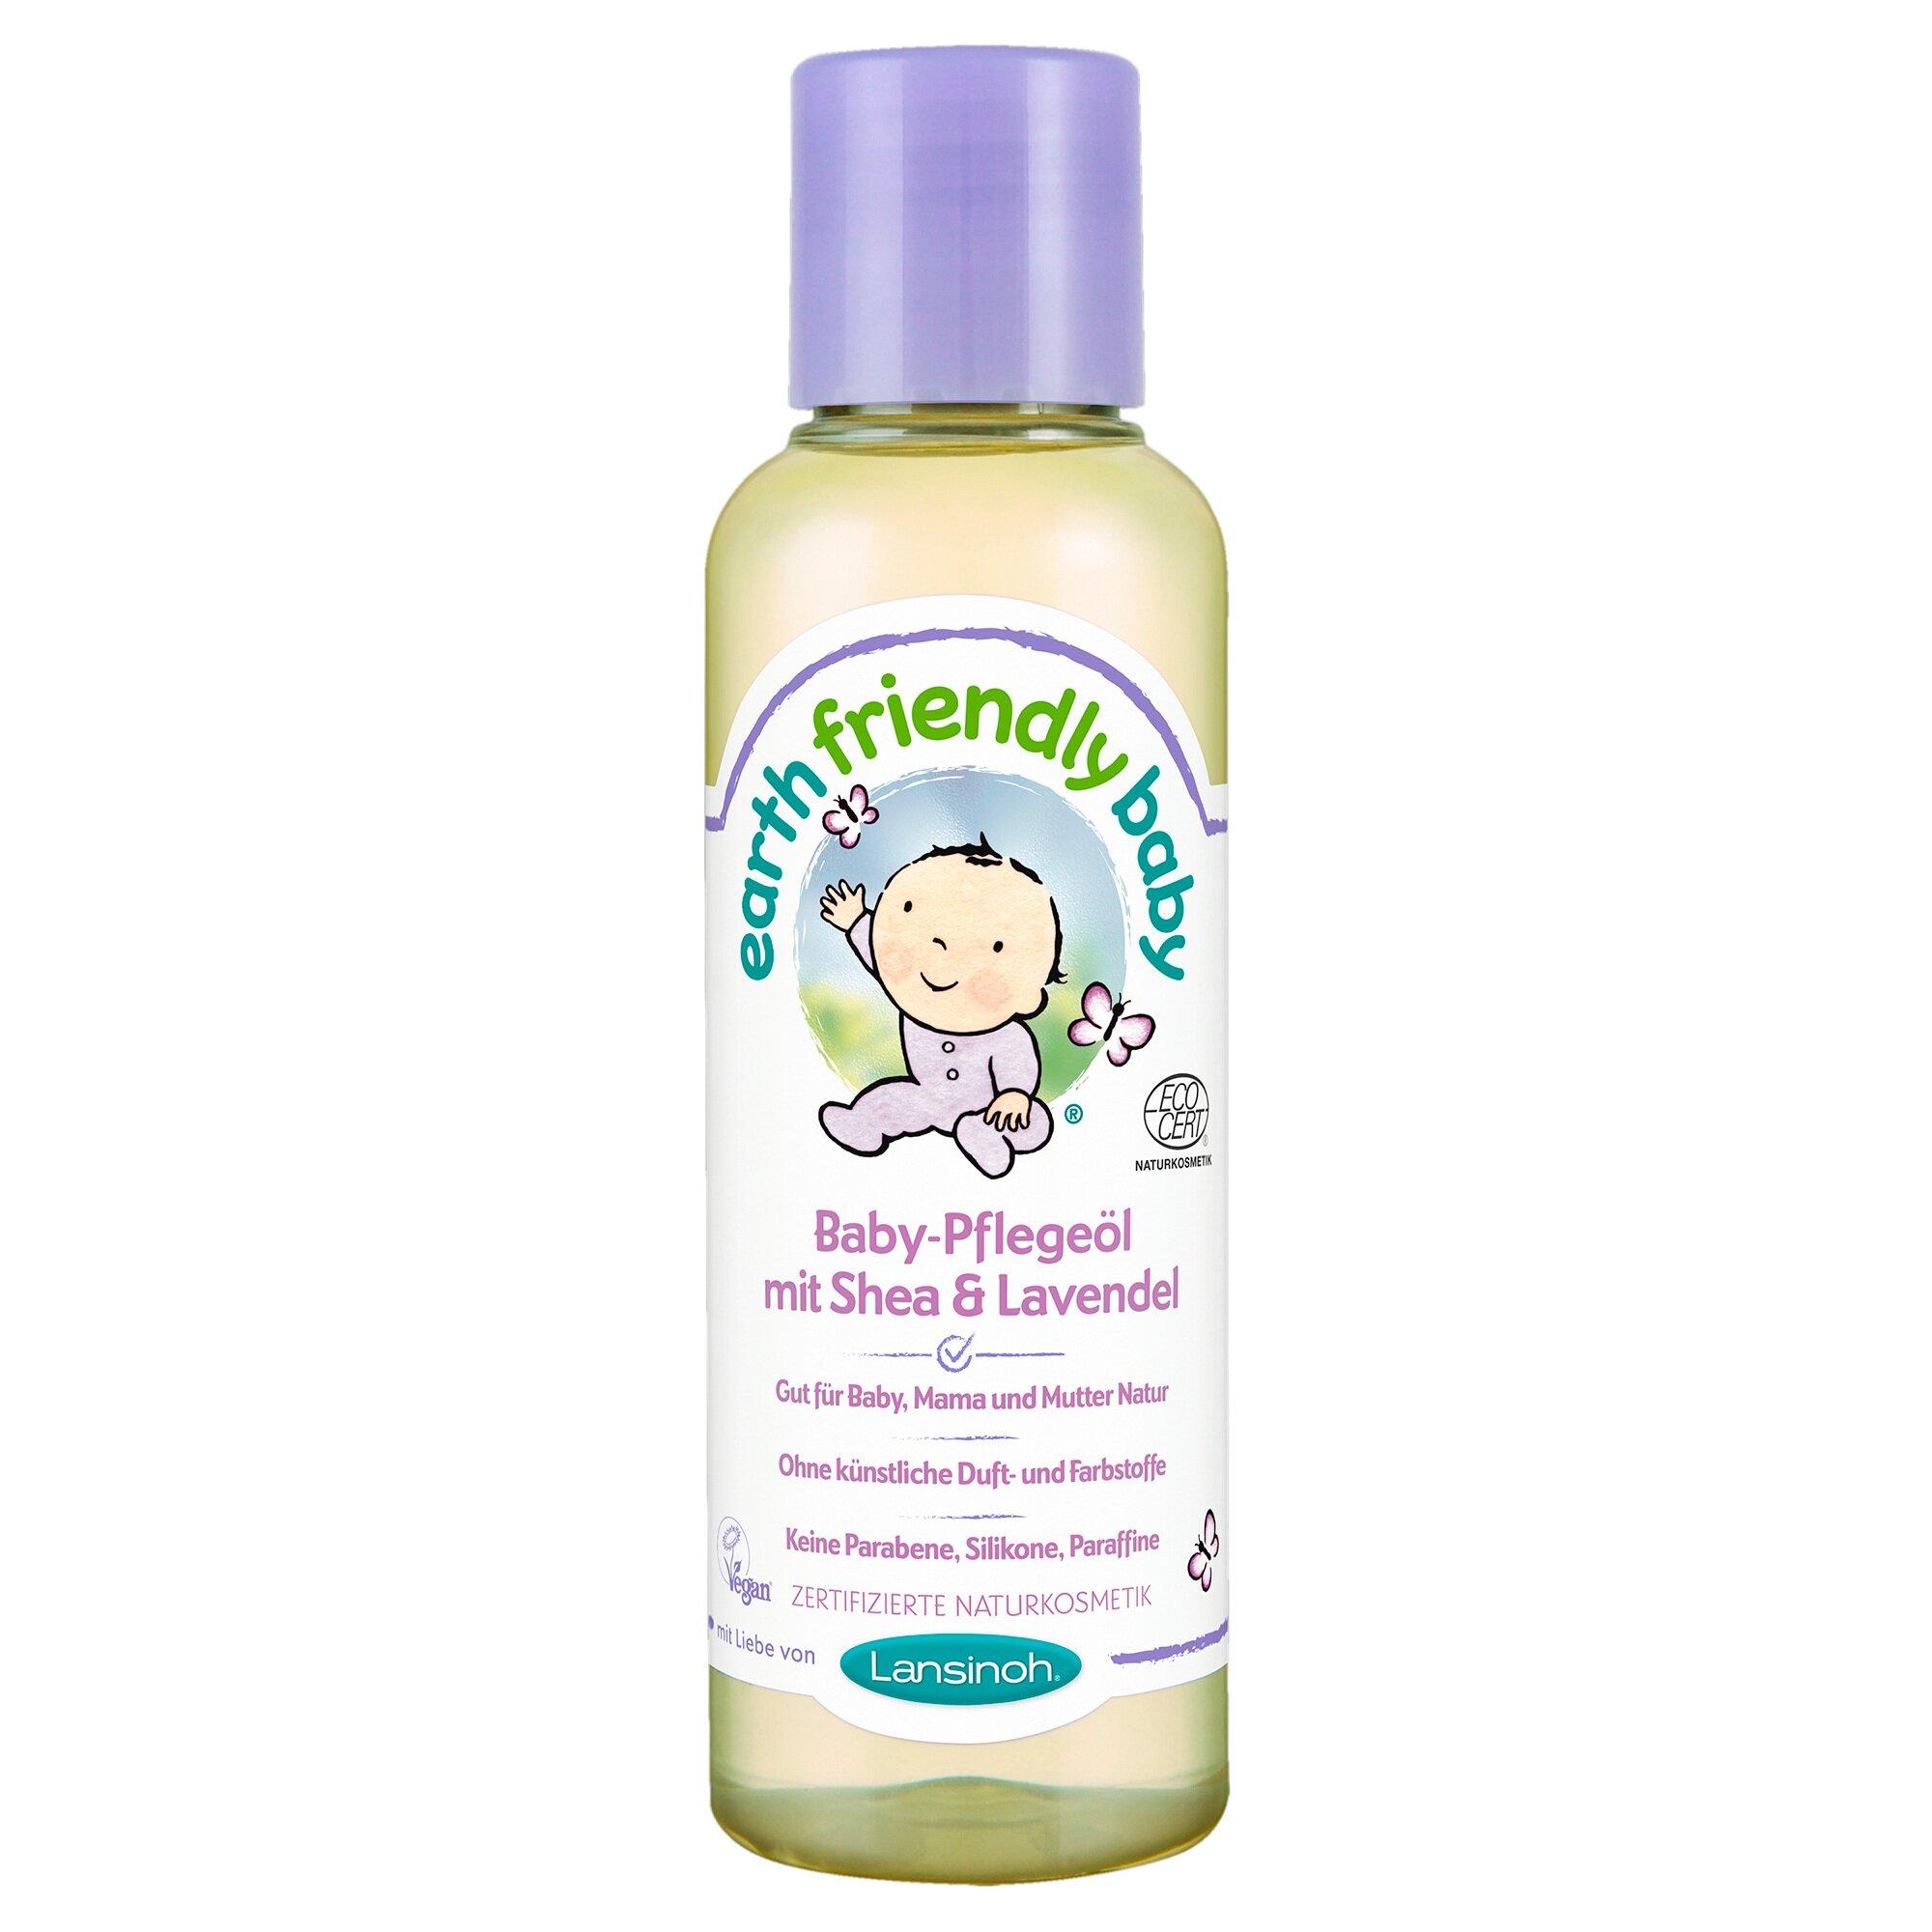 Earth Friendly Baby Pflegeöl mit Shea & Lavendel 125 ml